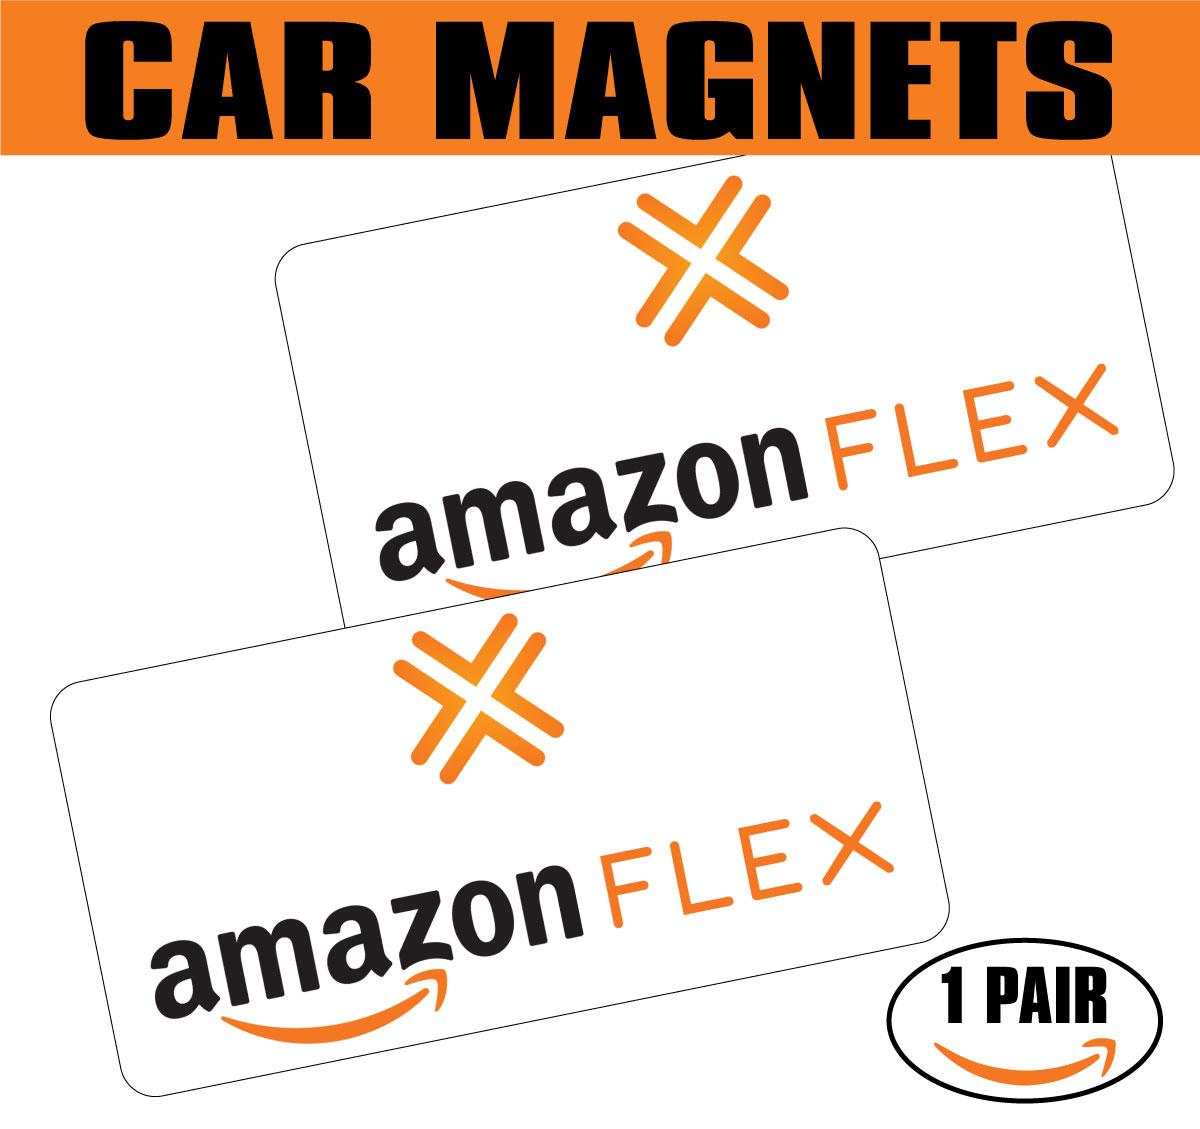 Car Magnets EBay - Custom car magnetscar magnets magnetic car signscustom car magnets vehicle magnets